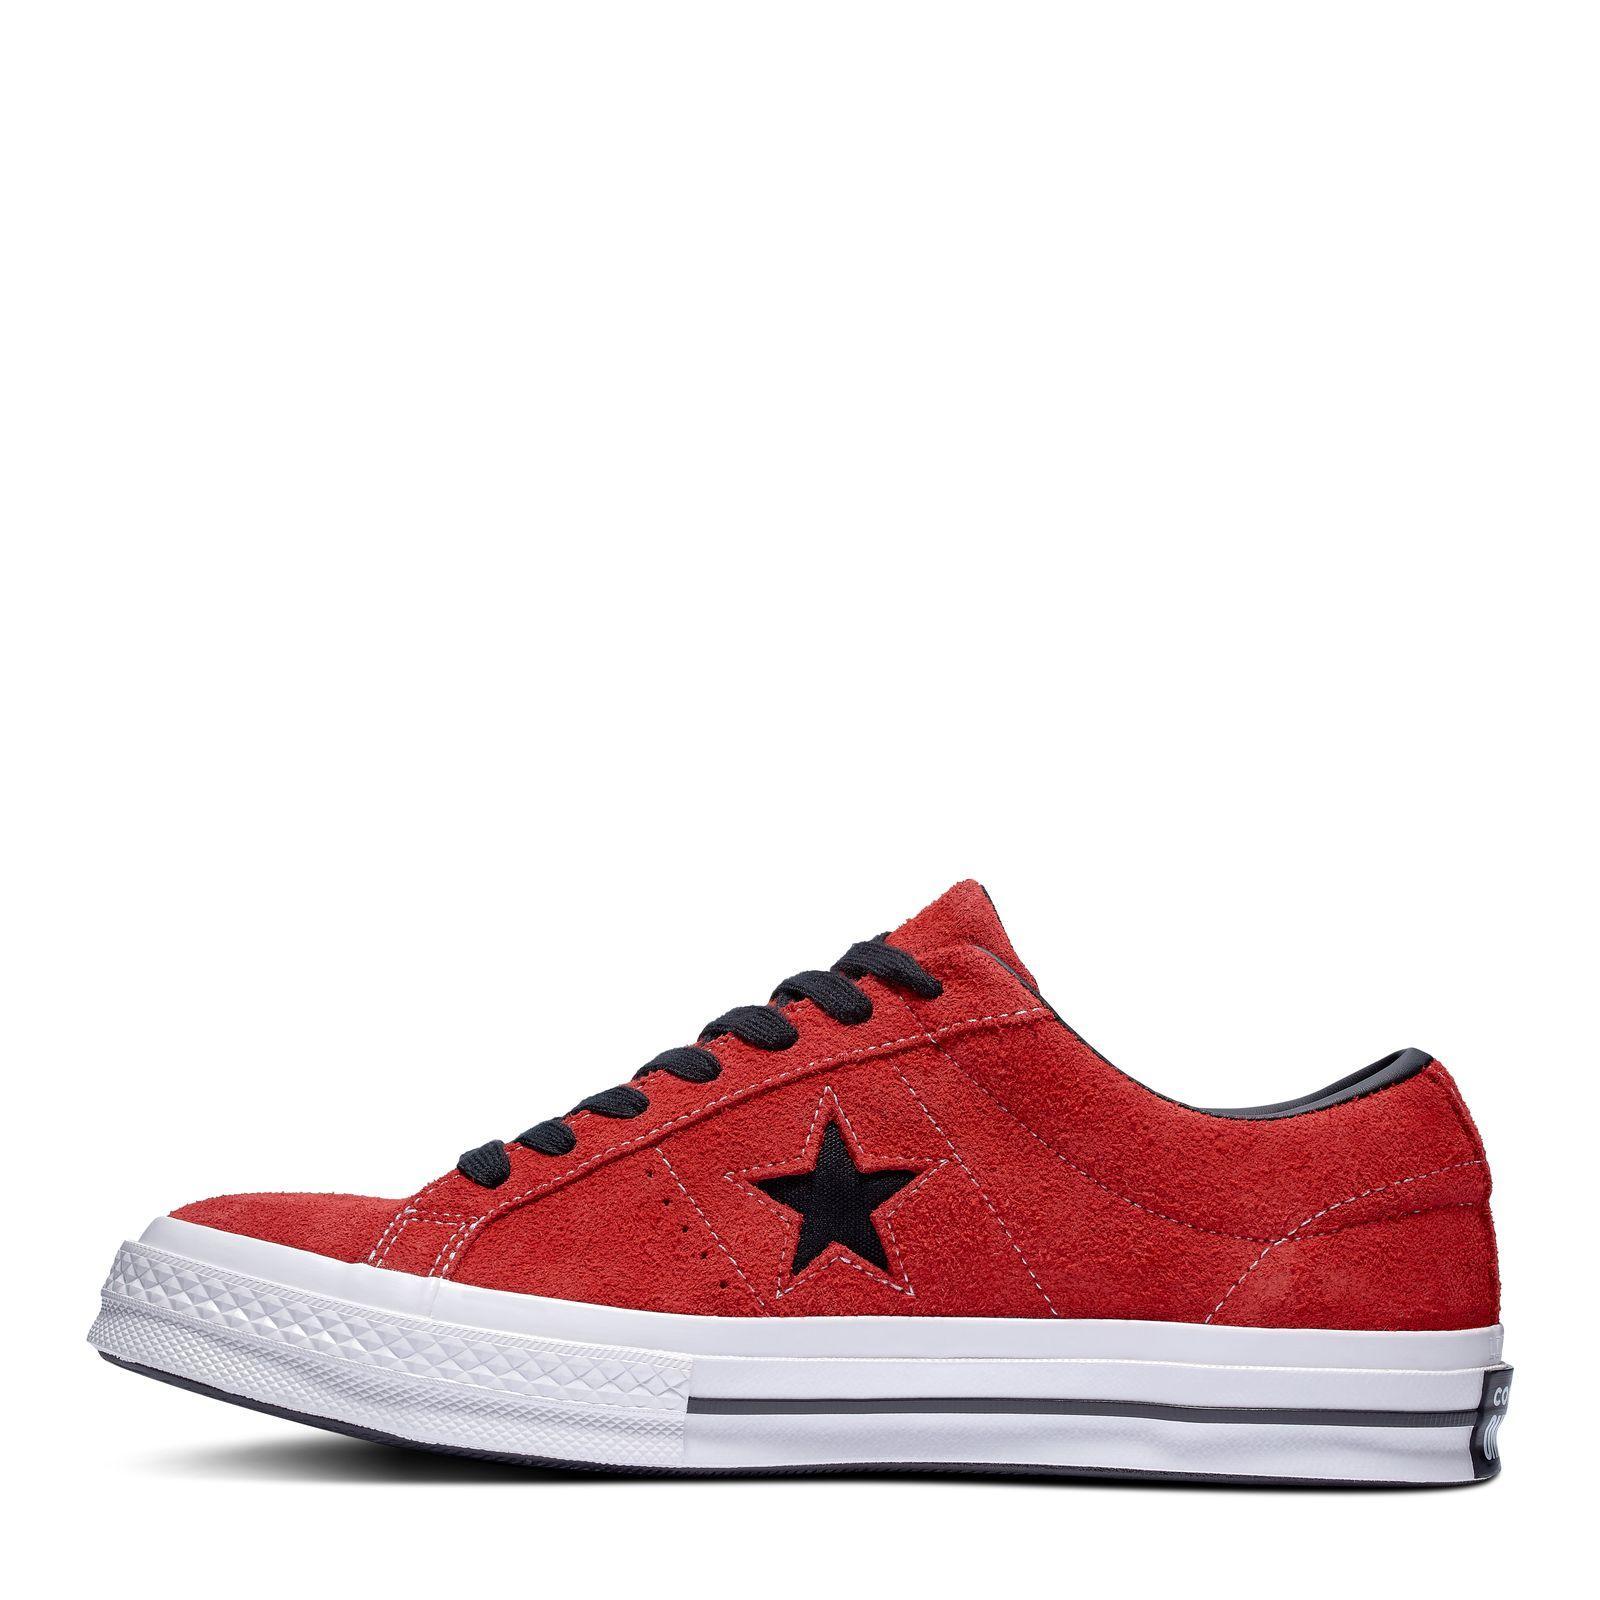 CONVERSE ONE STAR DARK STAR VINTAGE SUEDE ENAMEL REDBLACKWHITE 812819 163246C